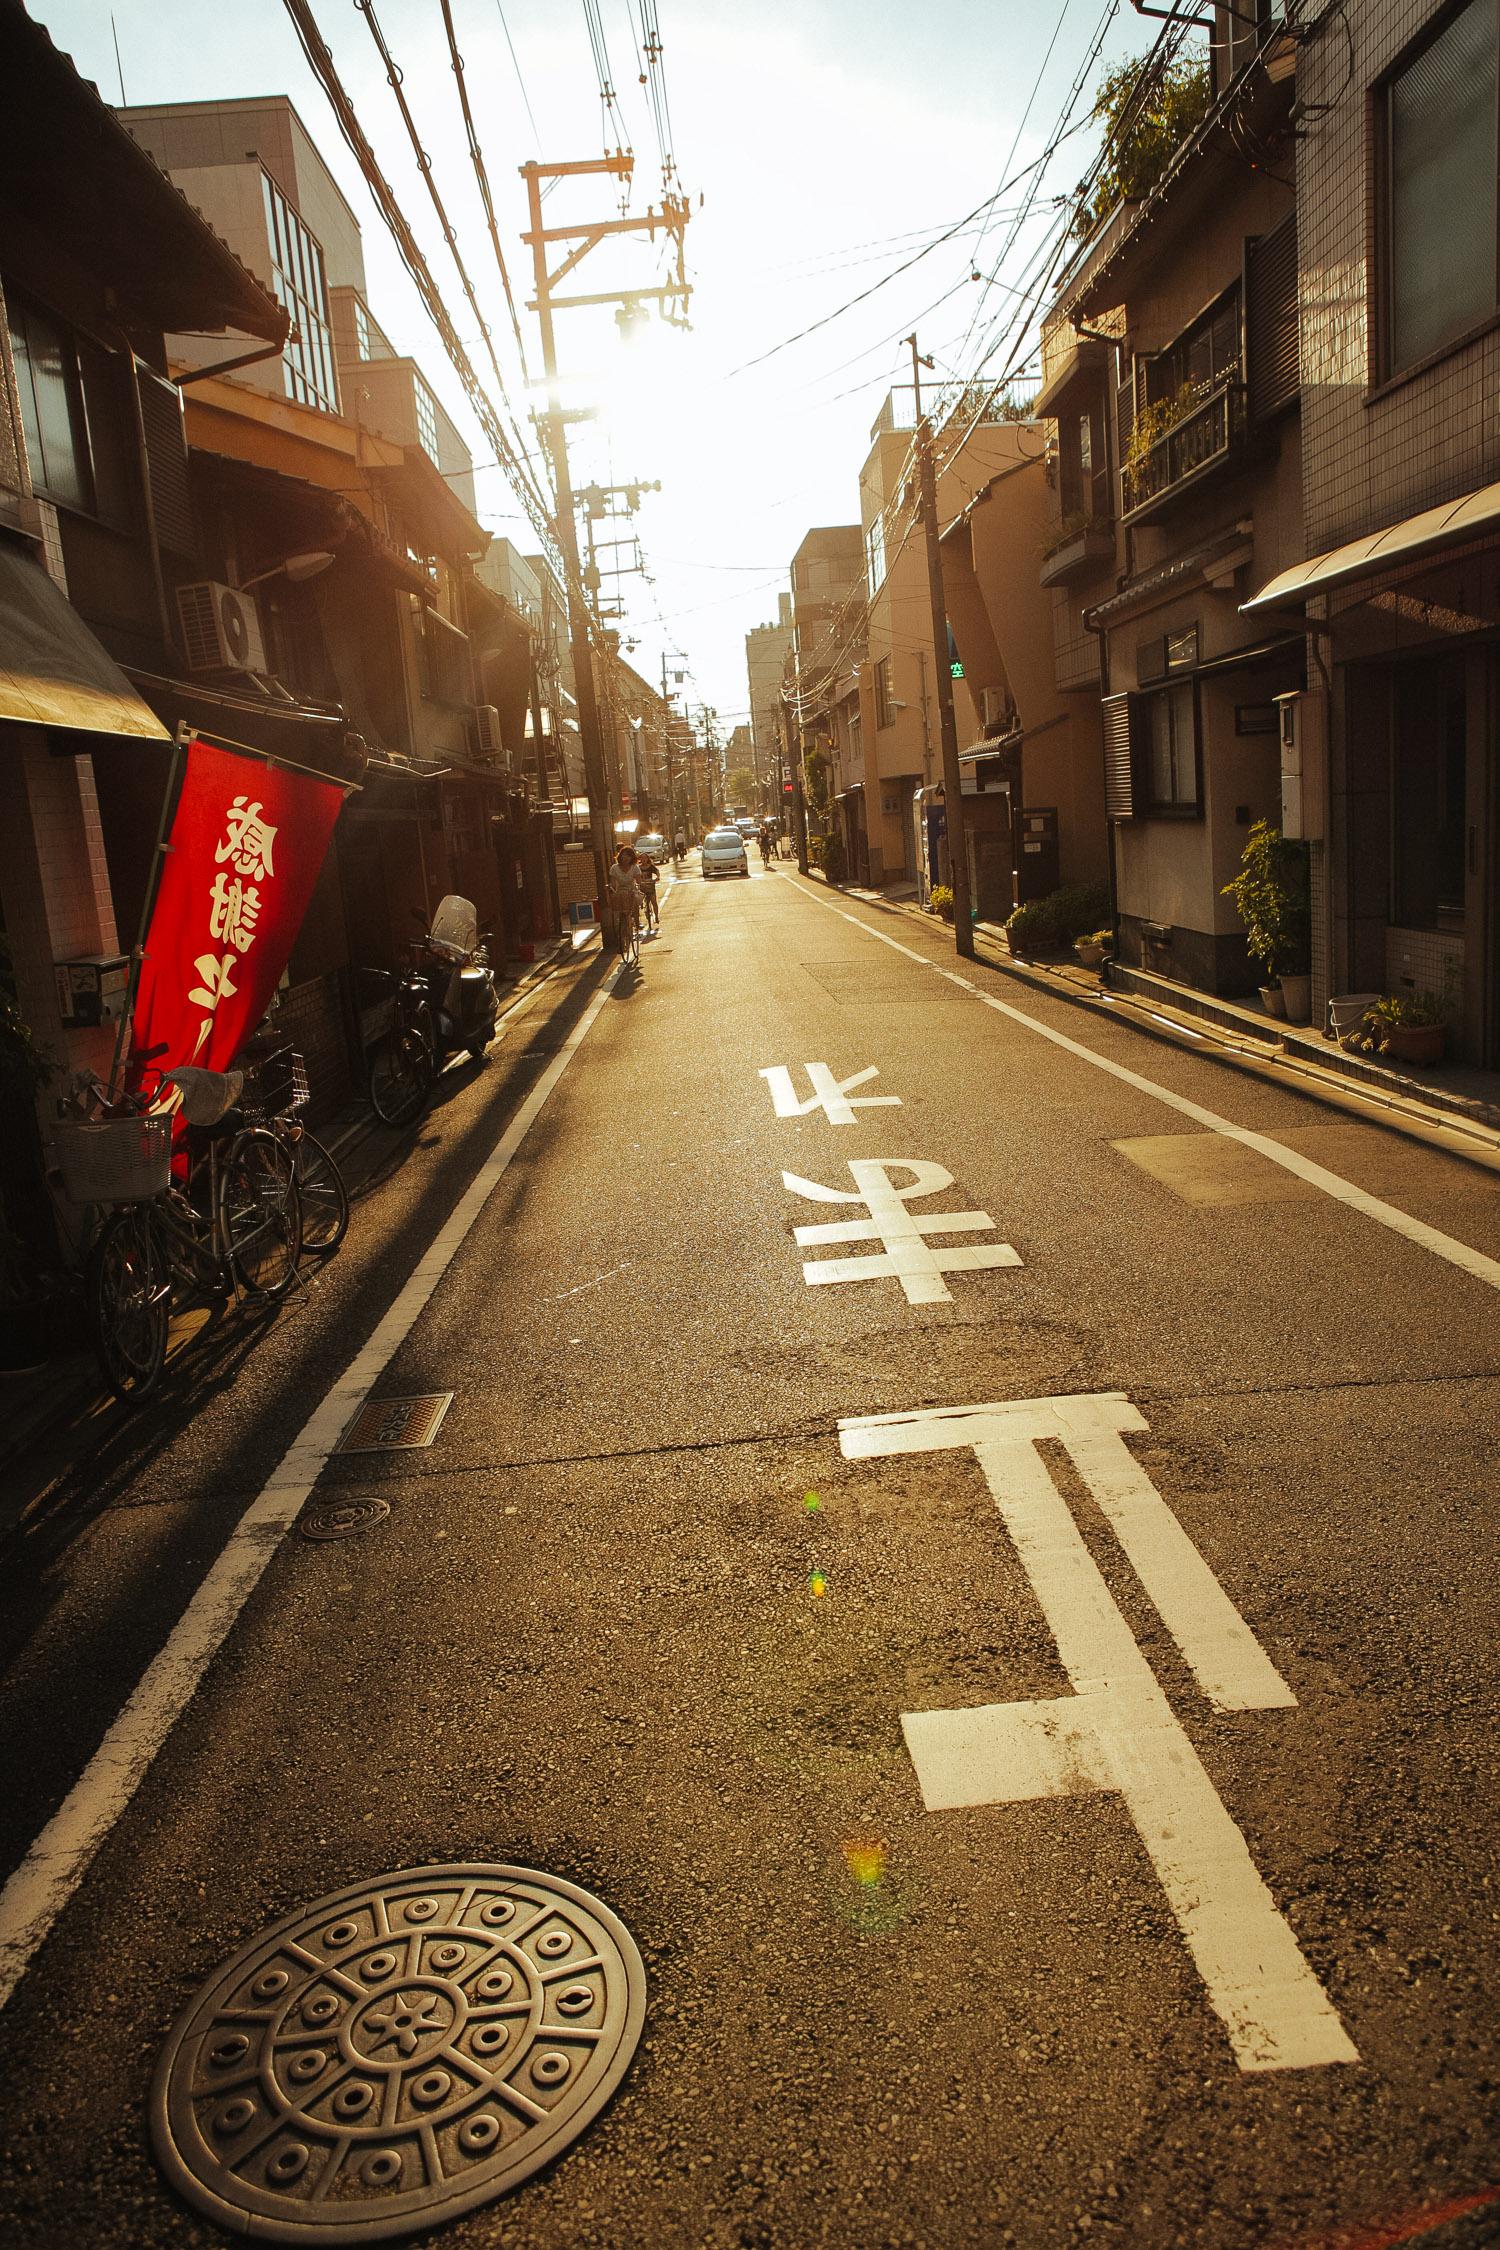 SqSpPort-Japan-3623.jpg